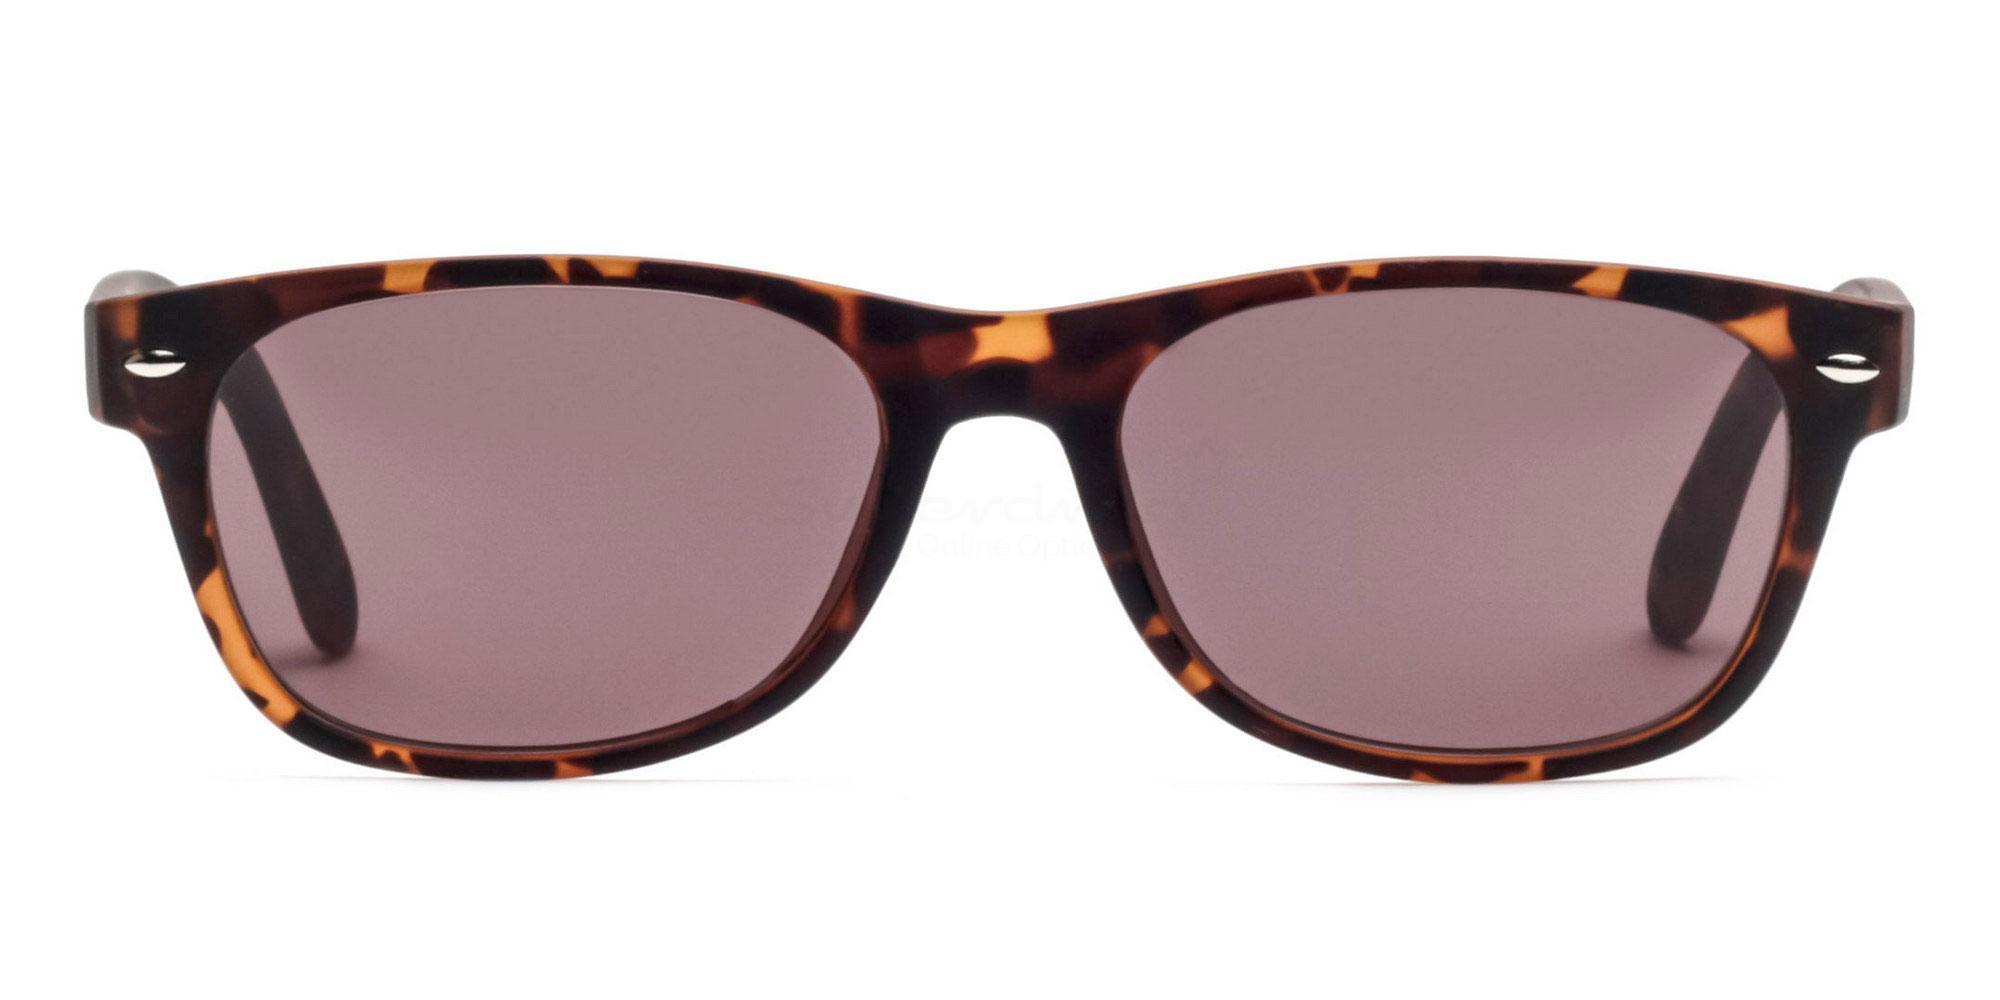 Tortoise S8122 - Tortoise (Sunglasses) Sunglasses, Helium